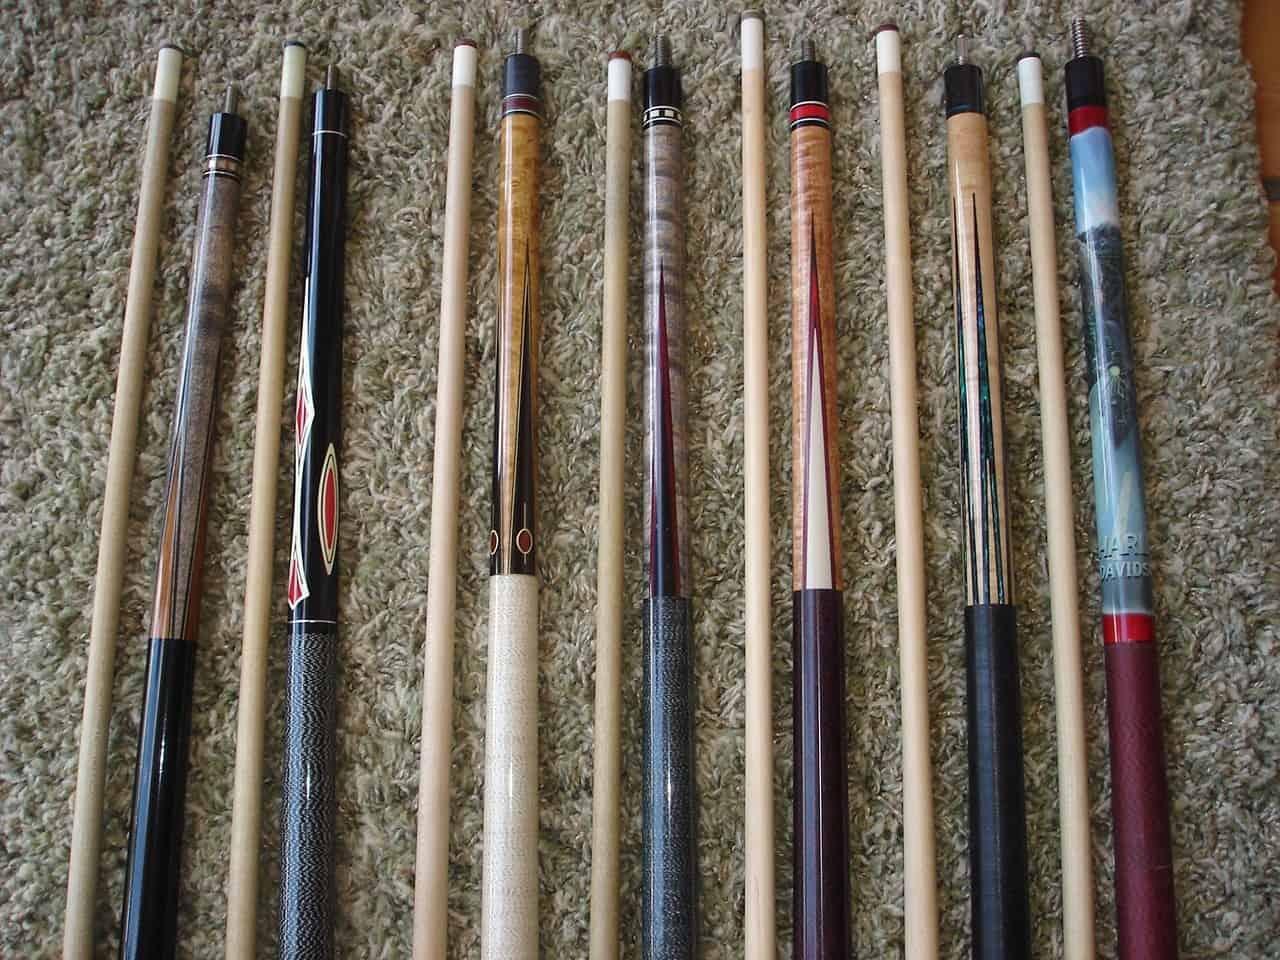 harley davidson cue sticks